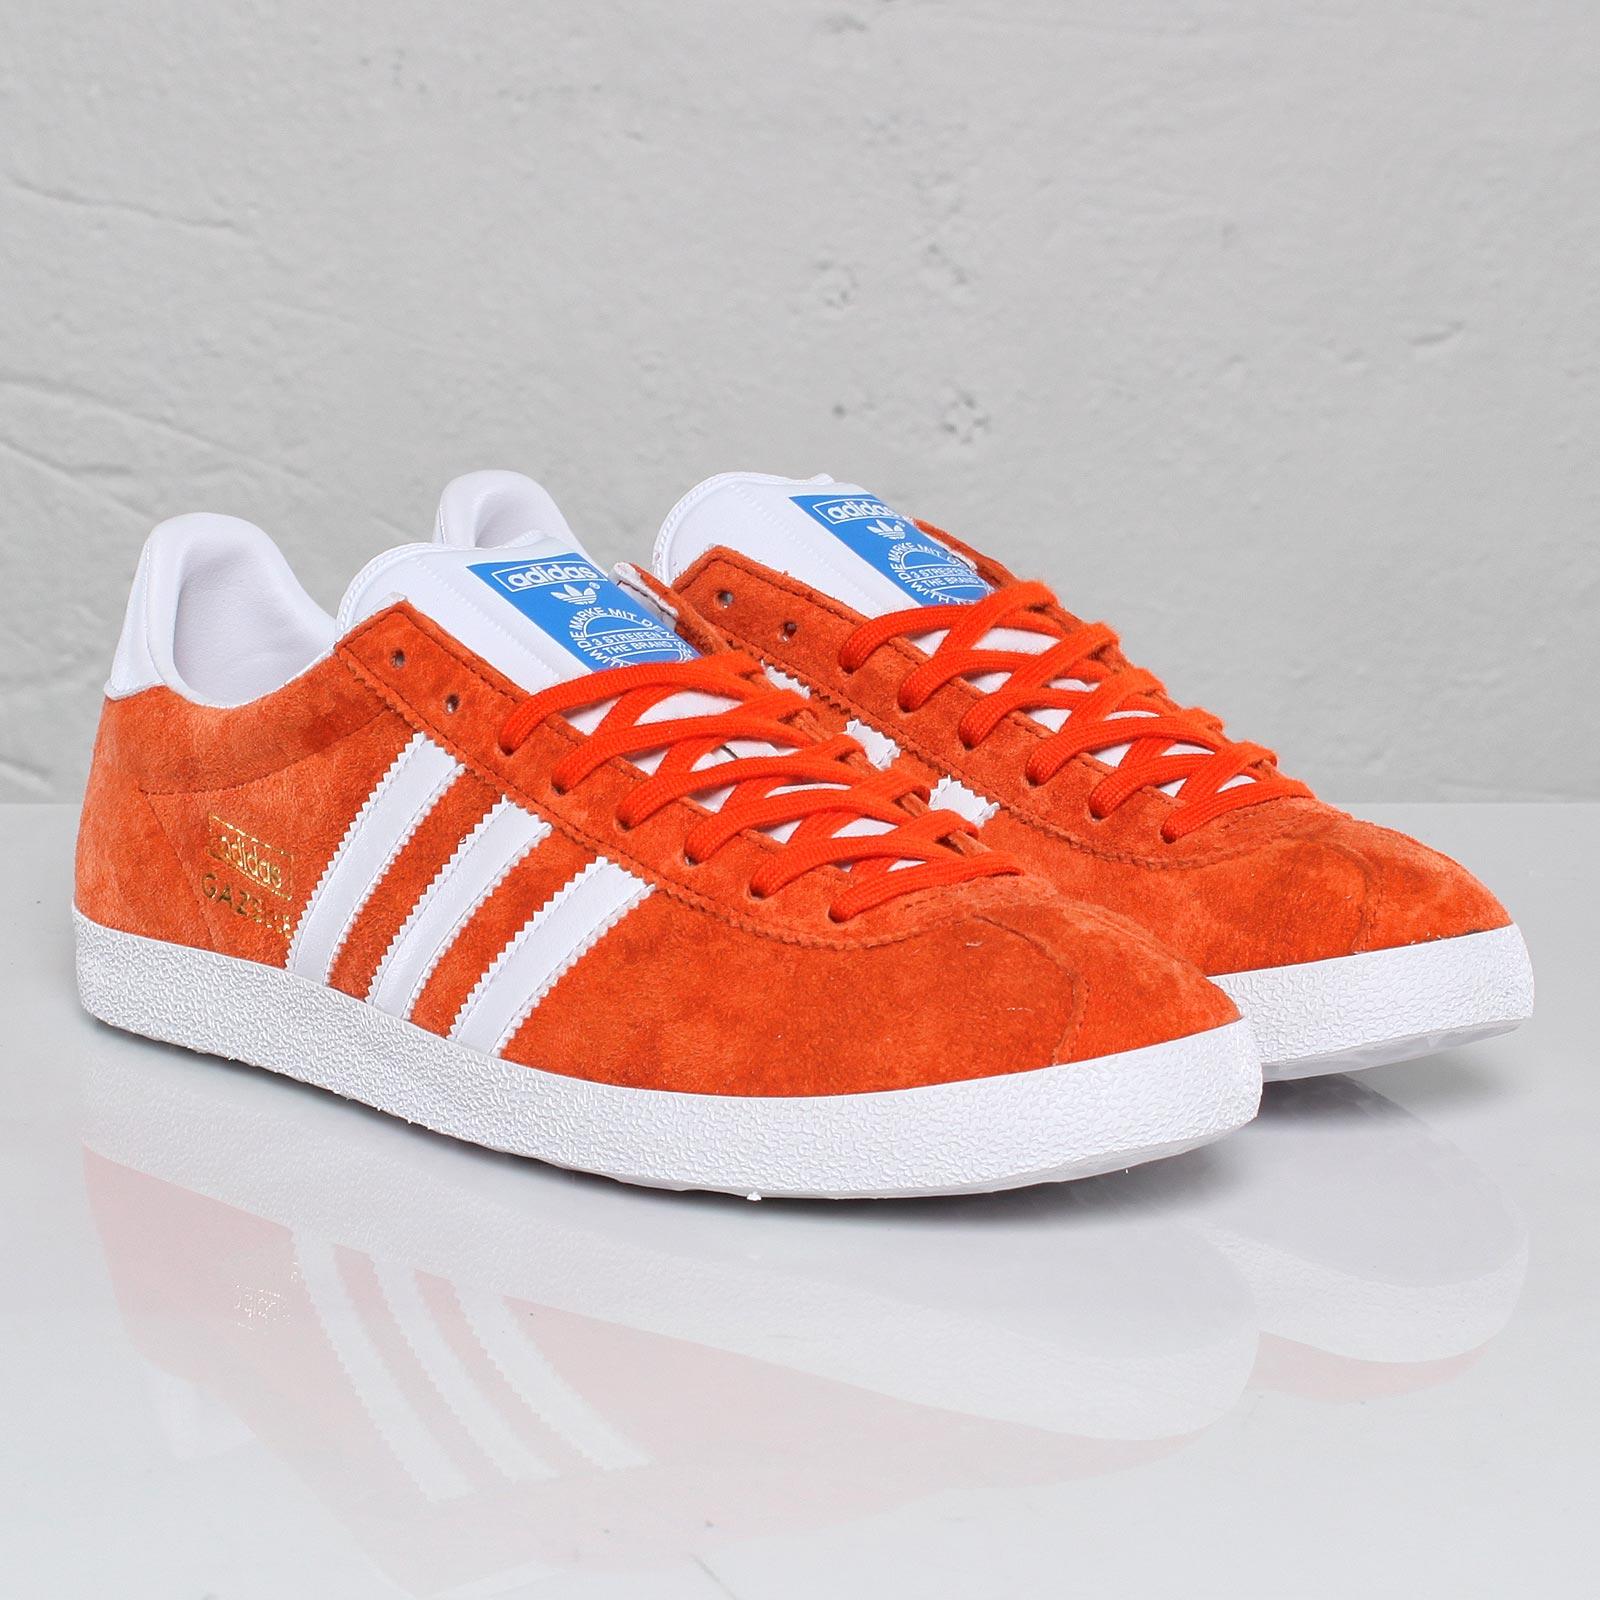 design intemporel f4a89 0bb37 adidas Gazelle OG - 101606 - Sneakersnstuff | sneakers ...